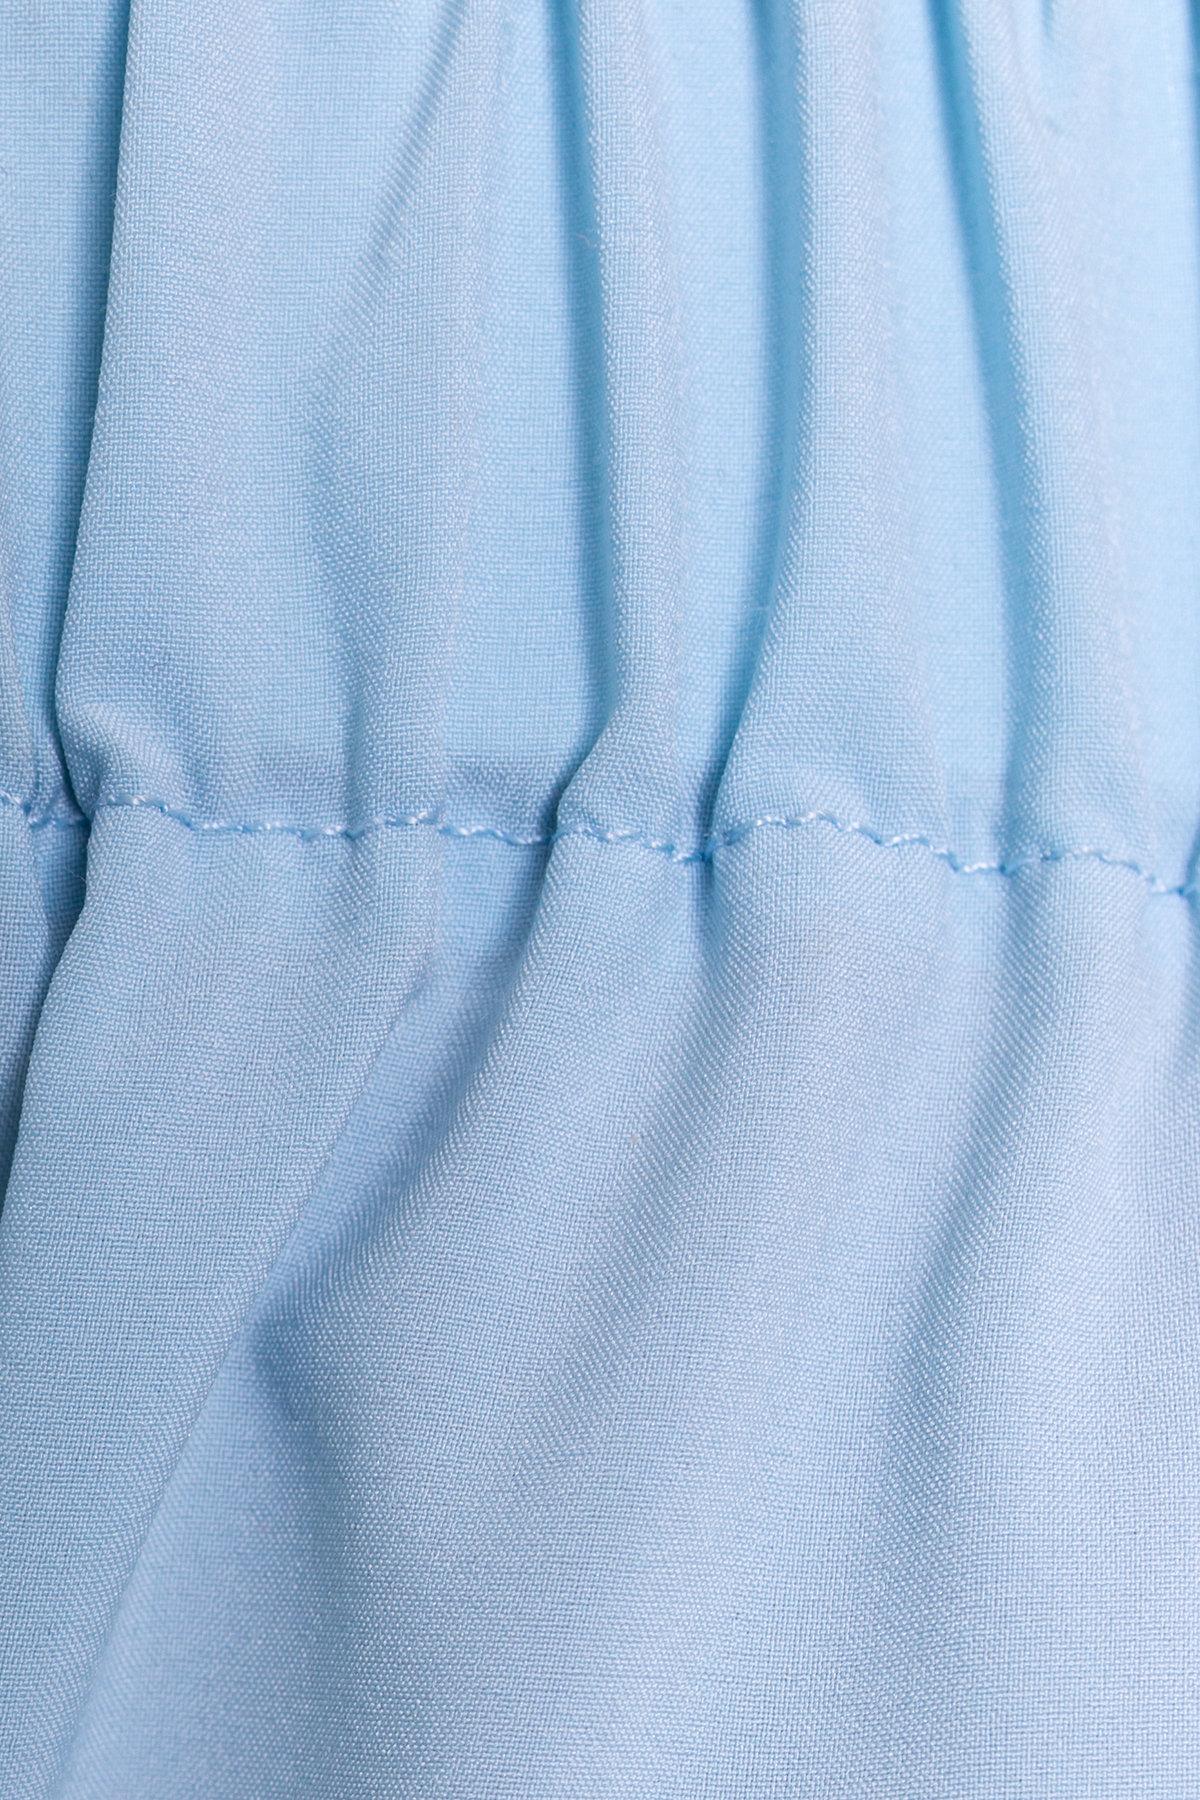 Платье - рубашка Фонда 307 Цвет: Голубой